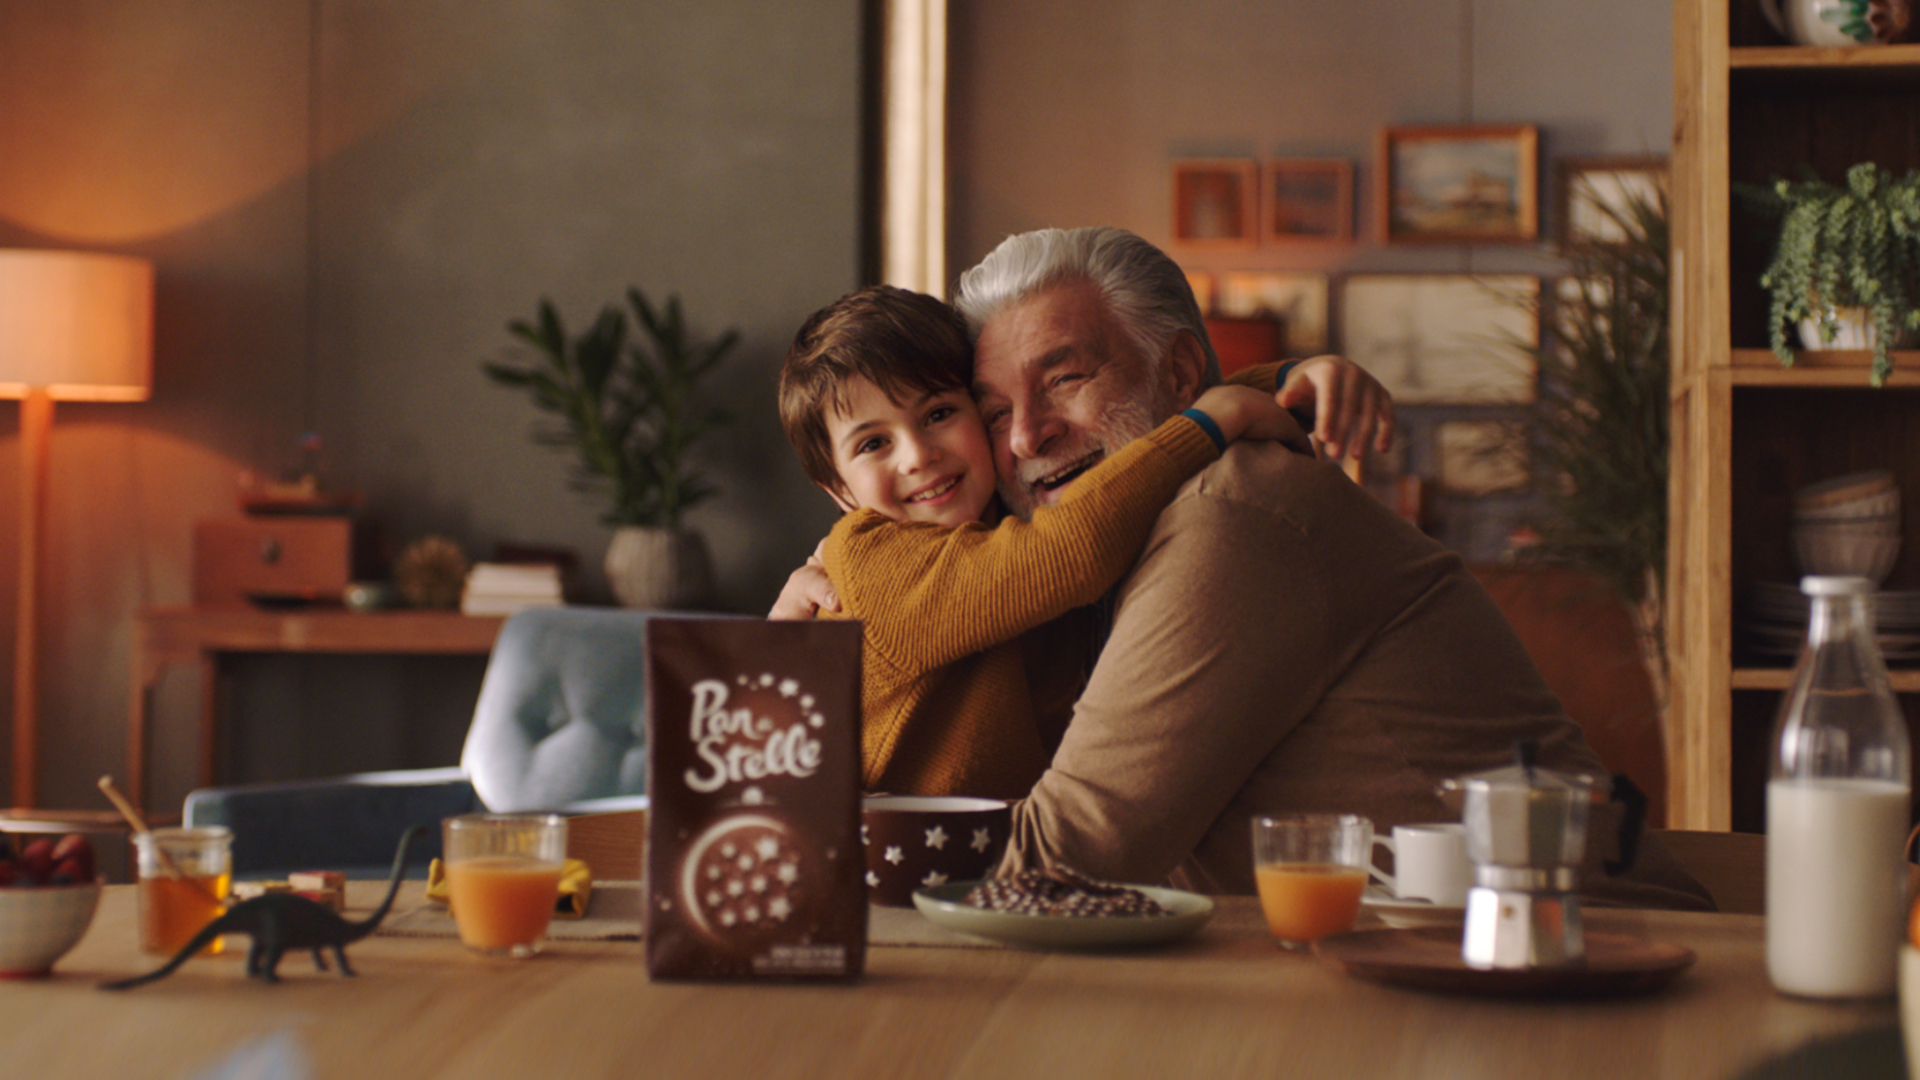 306101 pds biscotto 30 nonno v4.00001889 da4580 original 1552325105